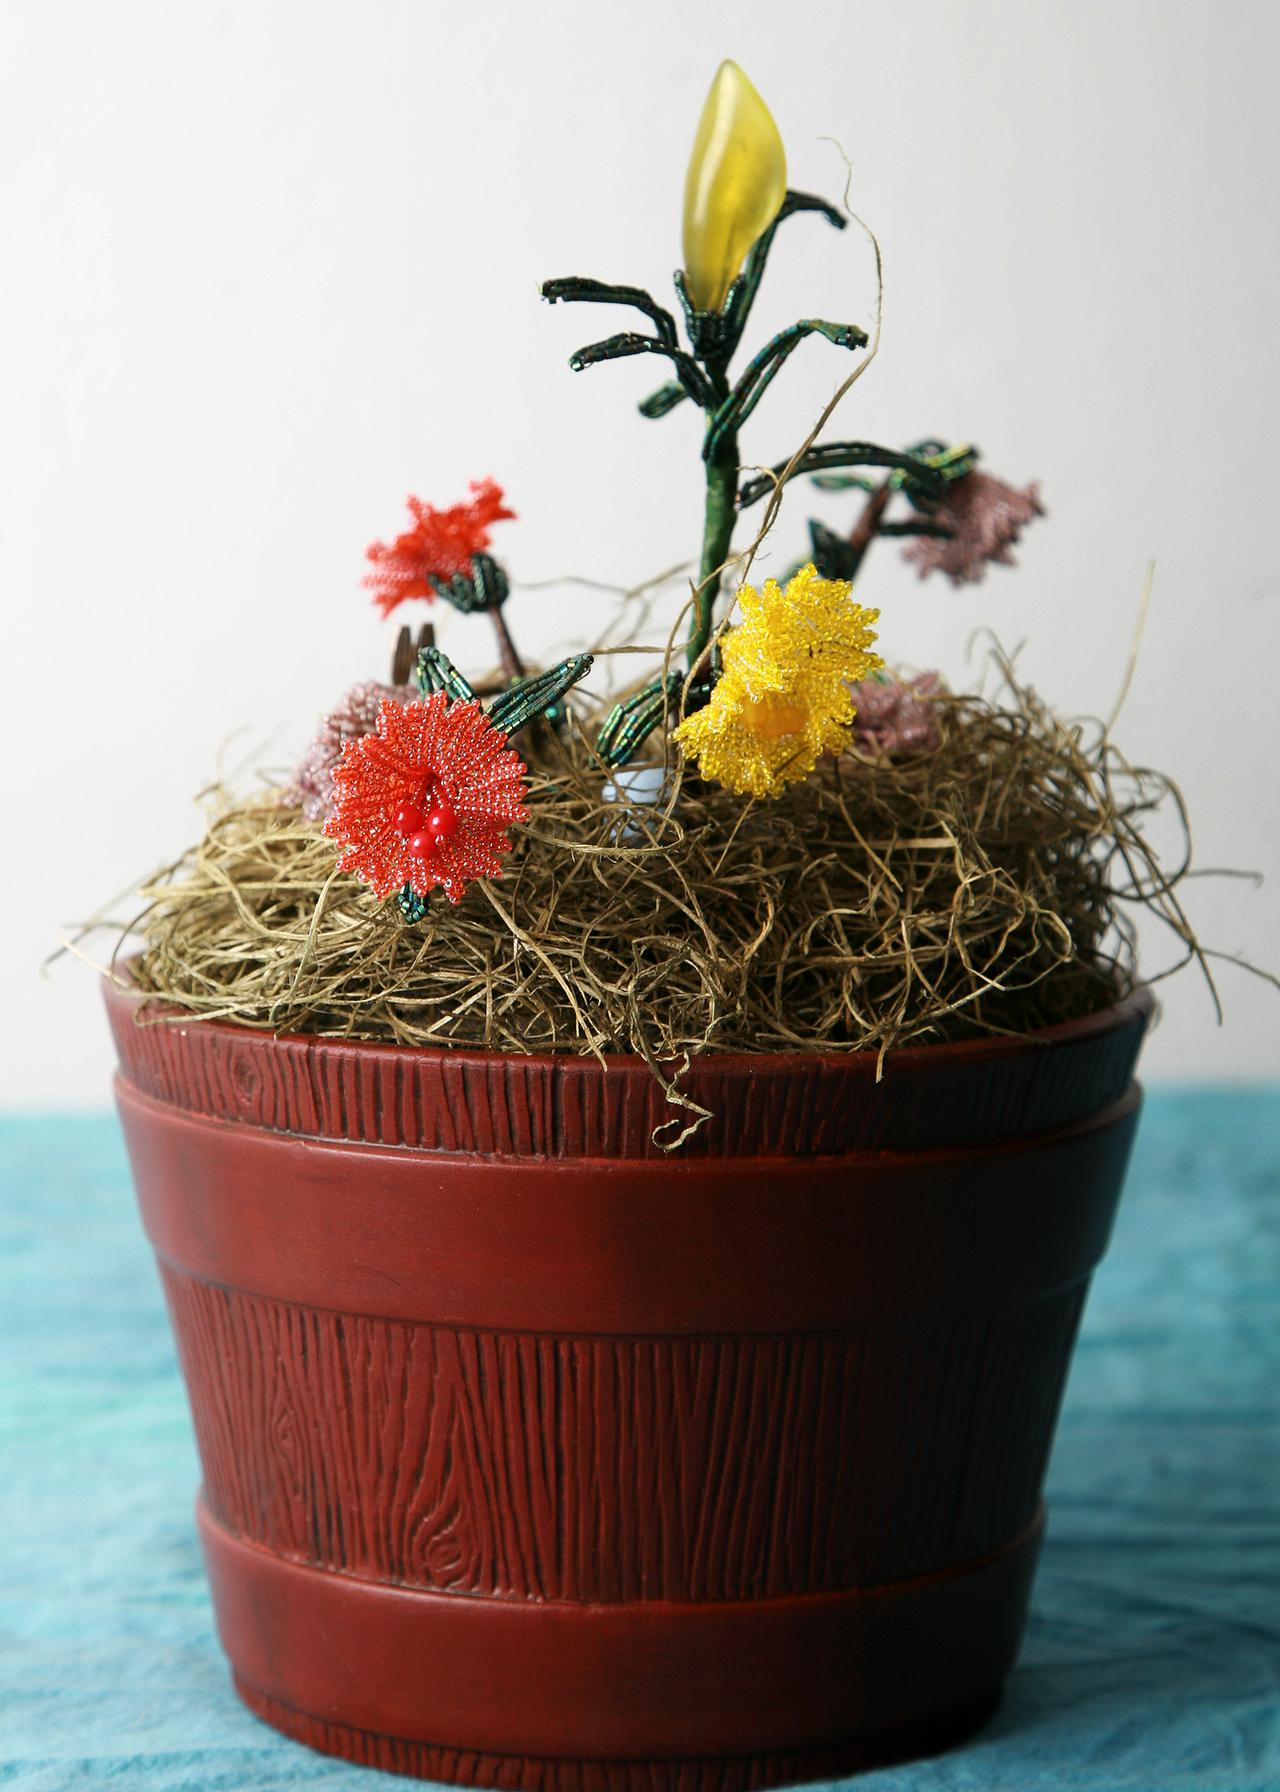 2e066056-0eb2-11e9-a48a-0242ac110003-flower_pot_pro.jpg